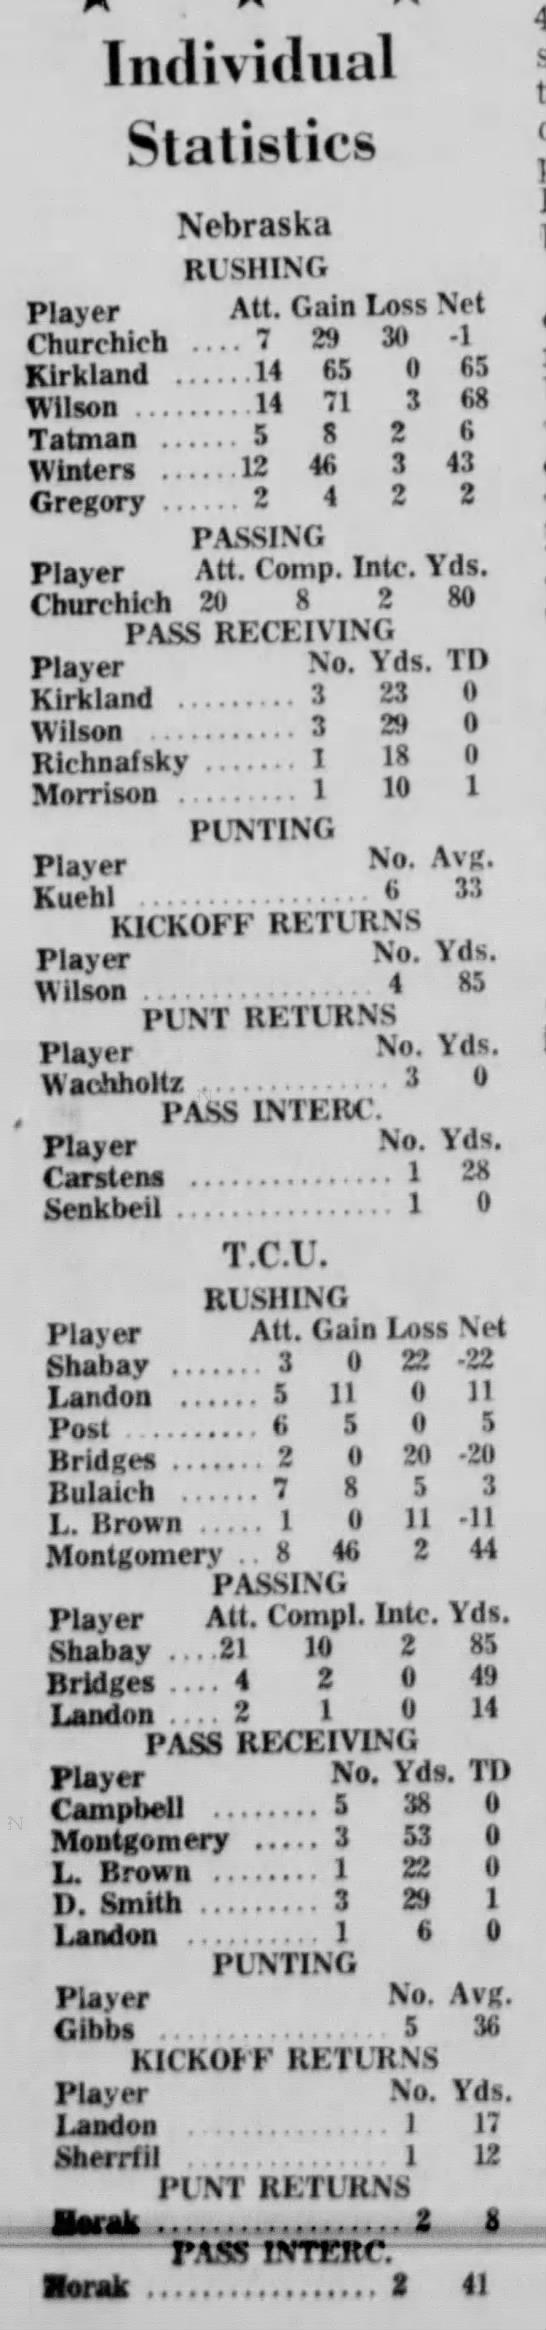 1966 Nebraska-TCU football game stats -